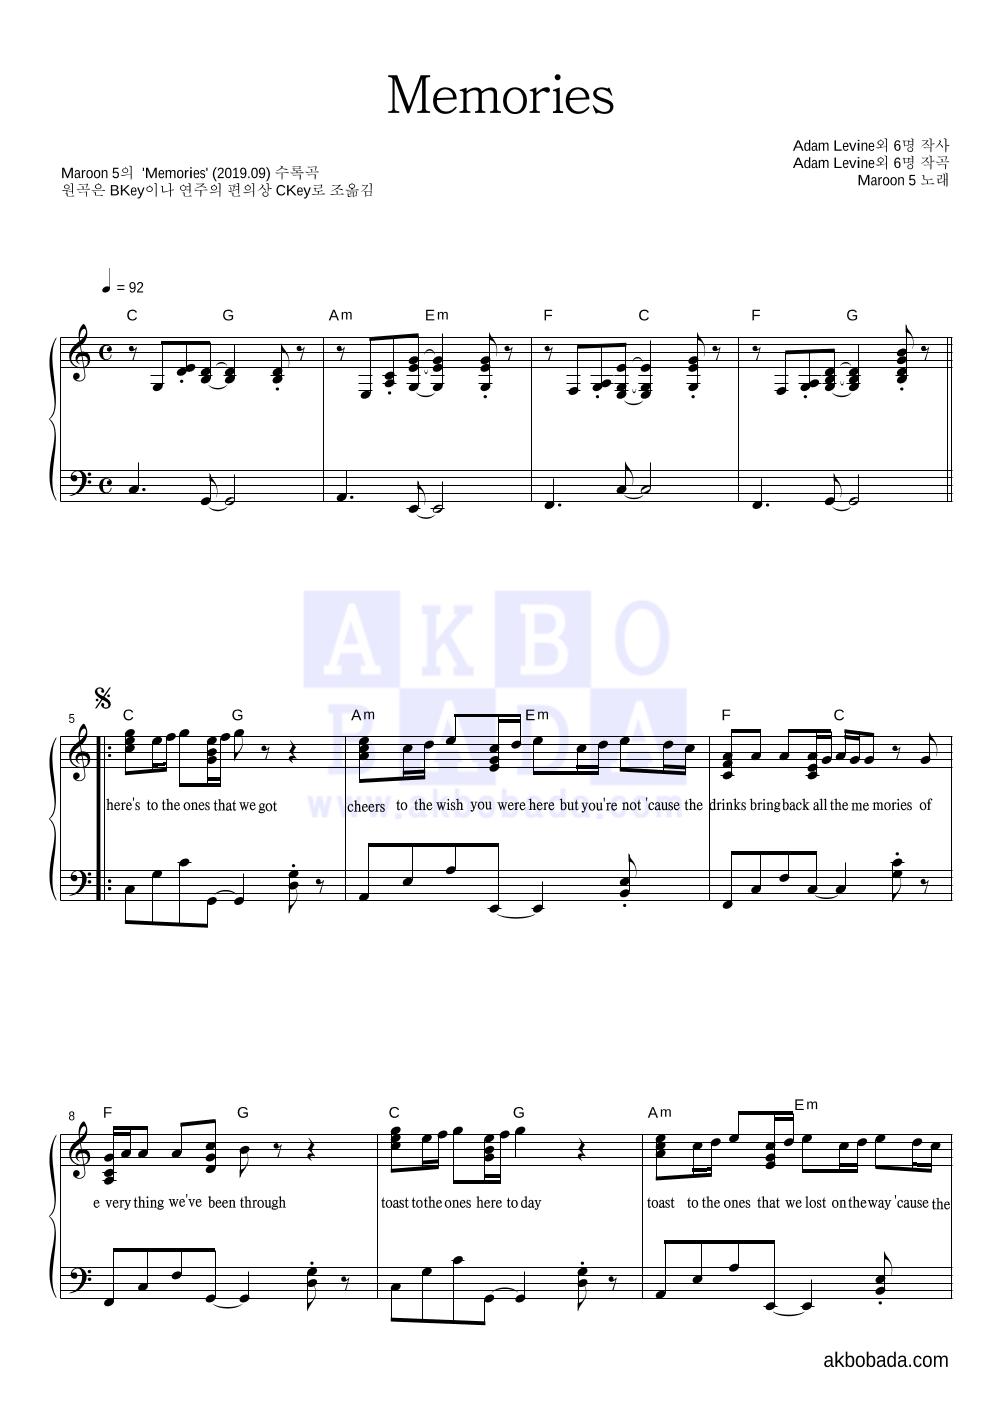 Maroon5 - Memories 피아노 2단 악보